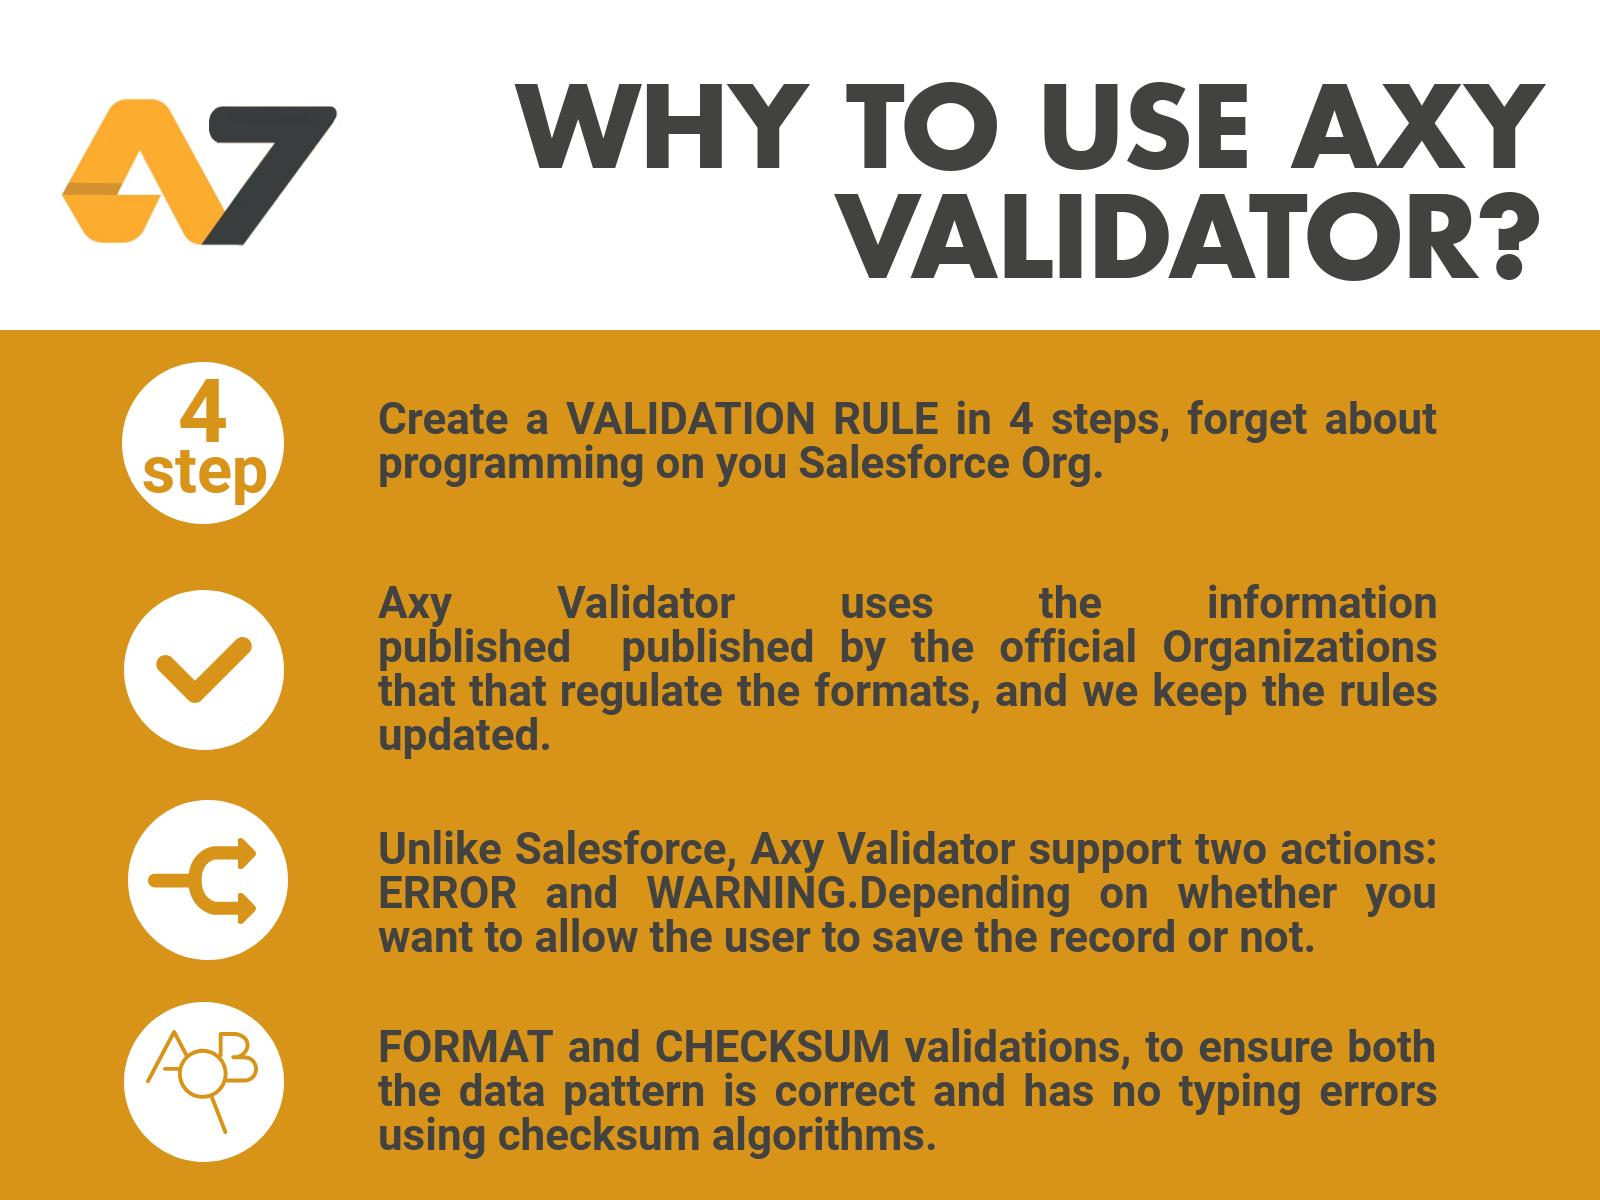 axy validator values